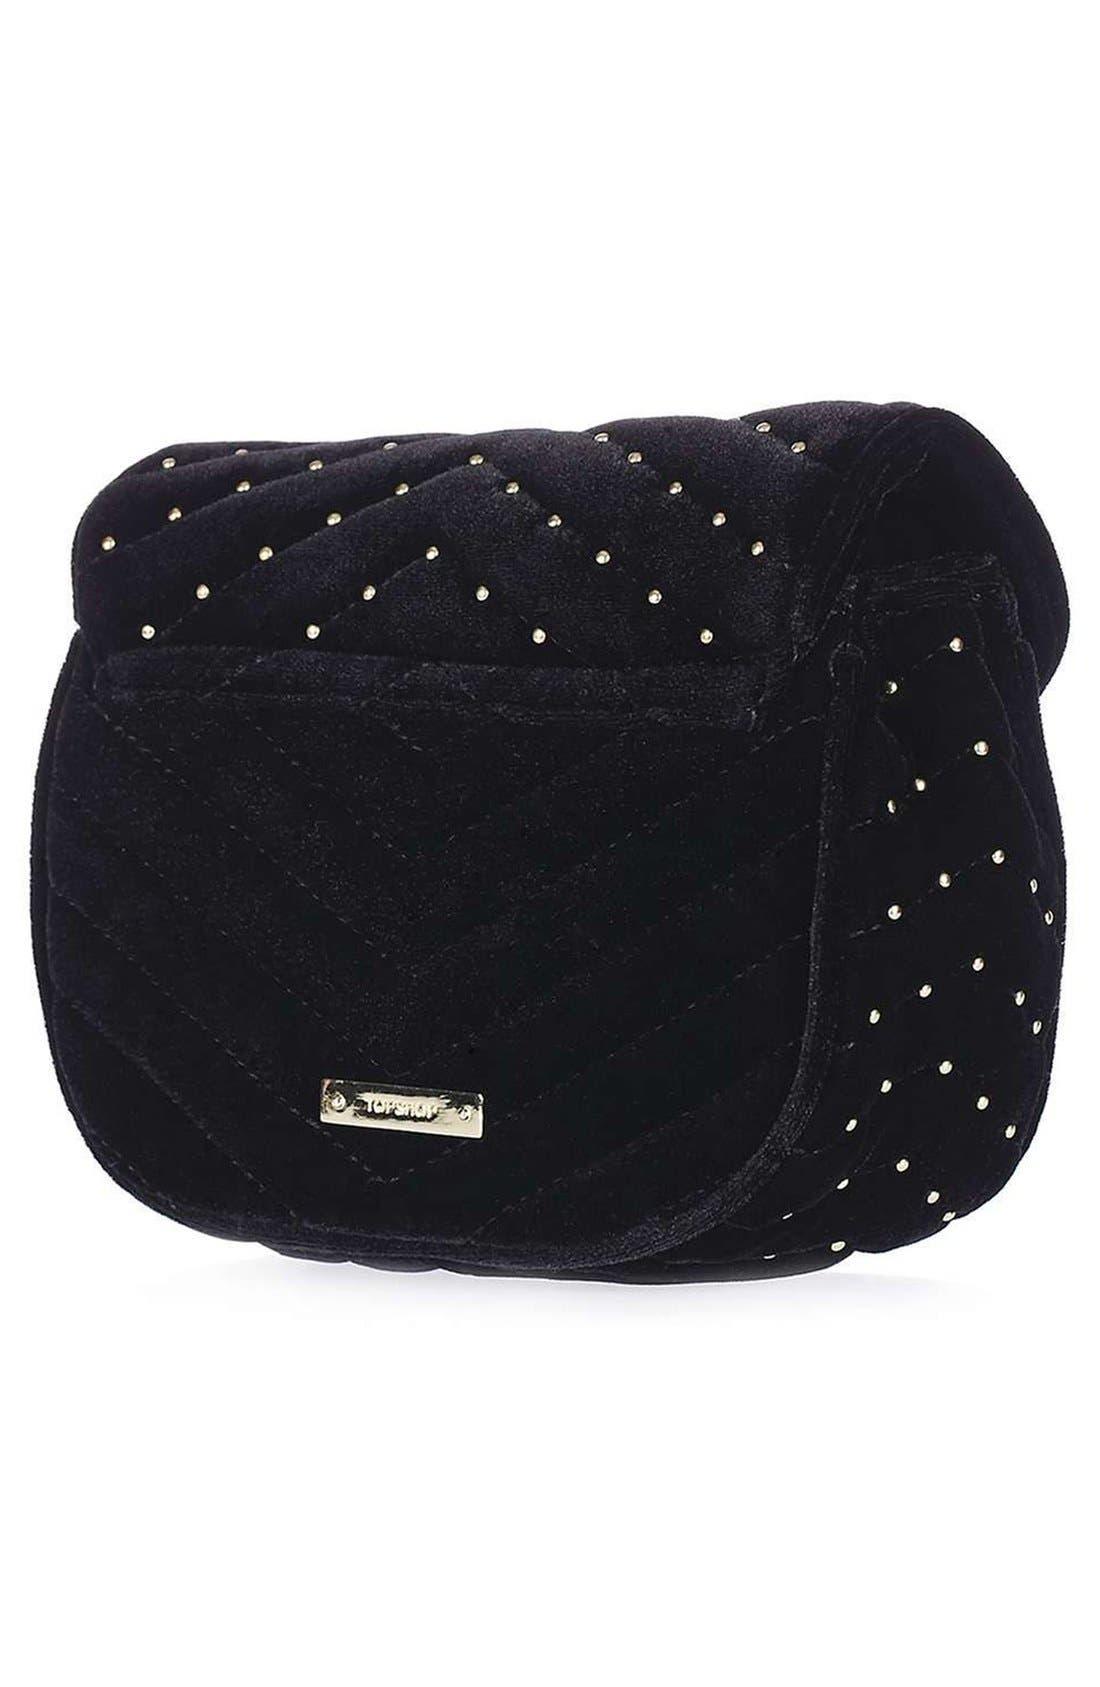 TOPSHOP, Embellished Velvet Crossbody Bag, Alternate thumbnail 5, color, 001